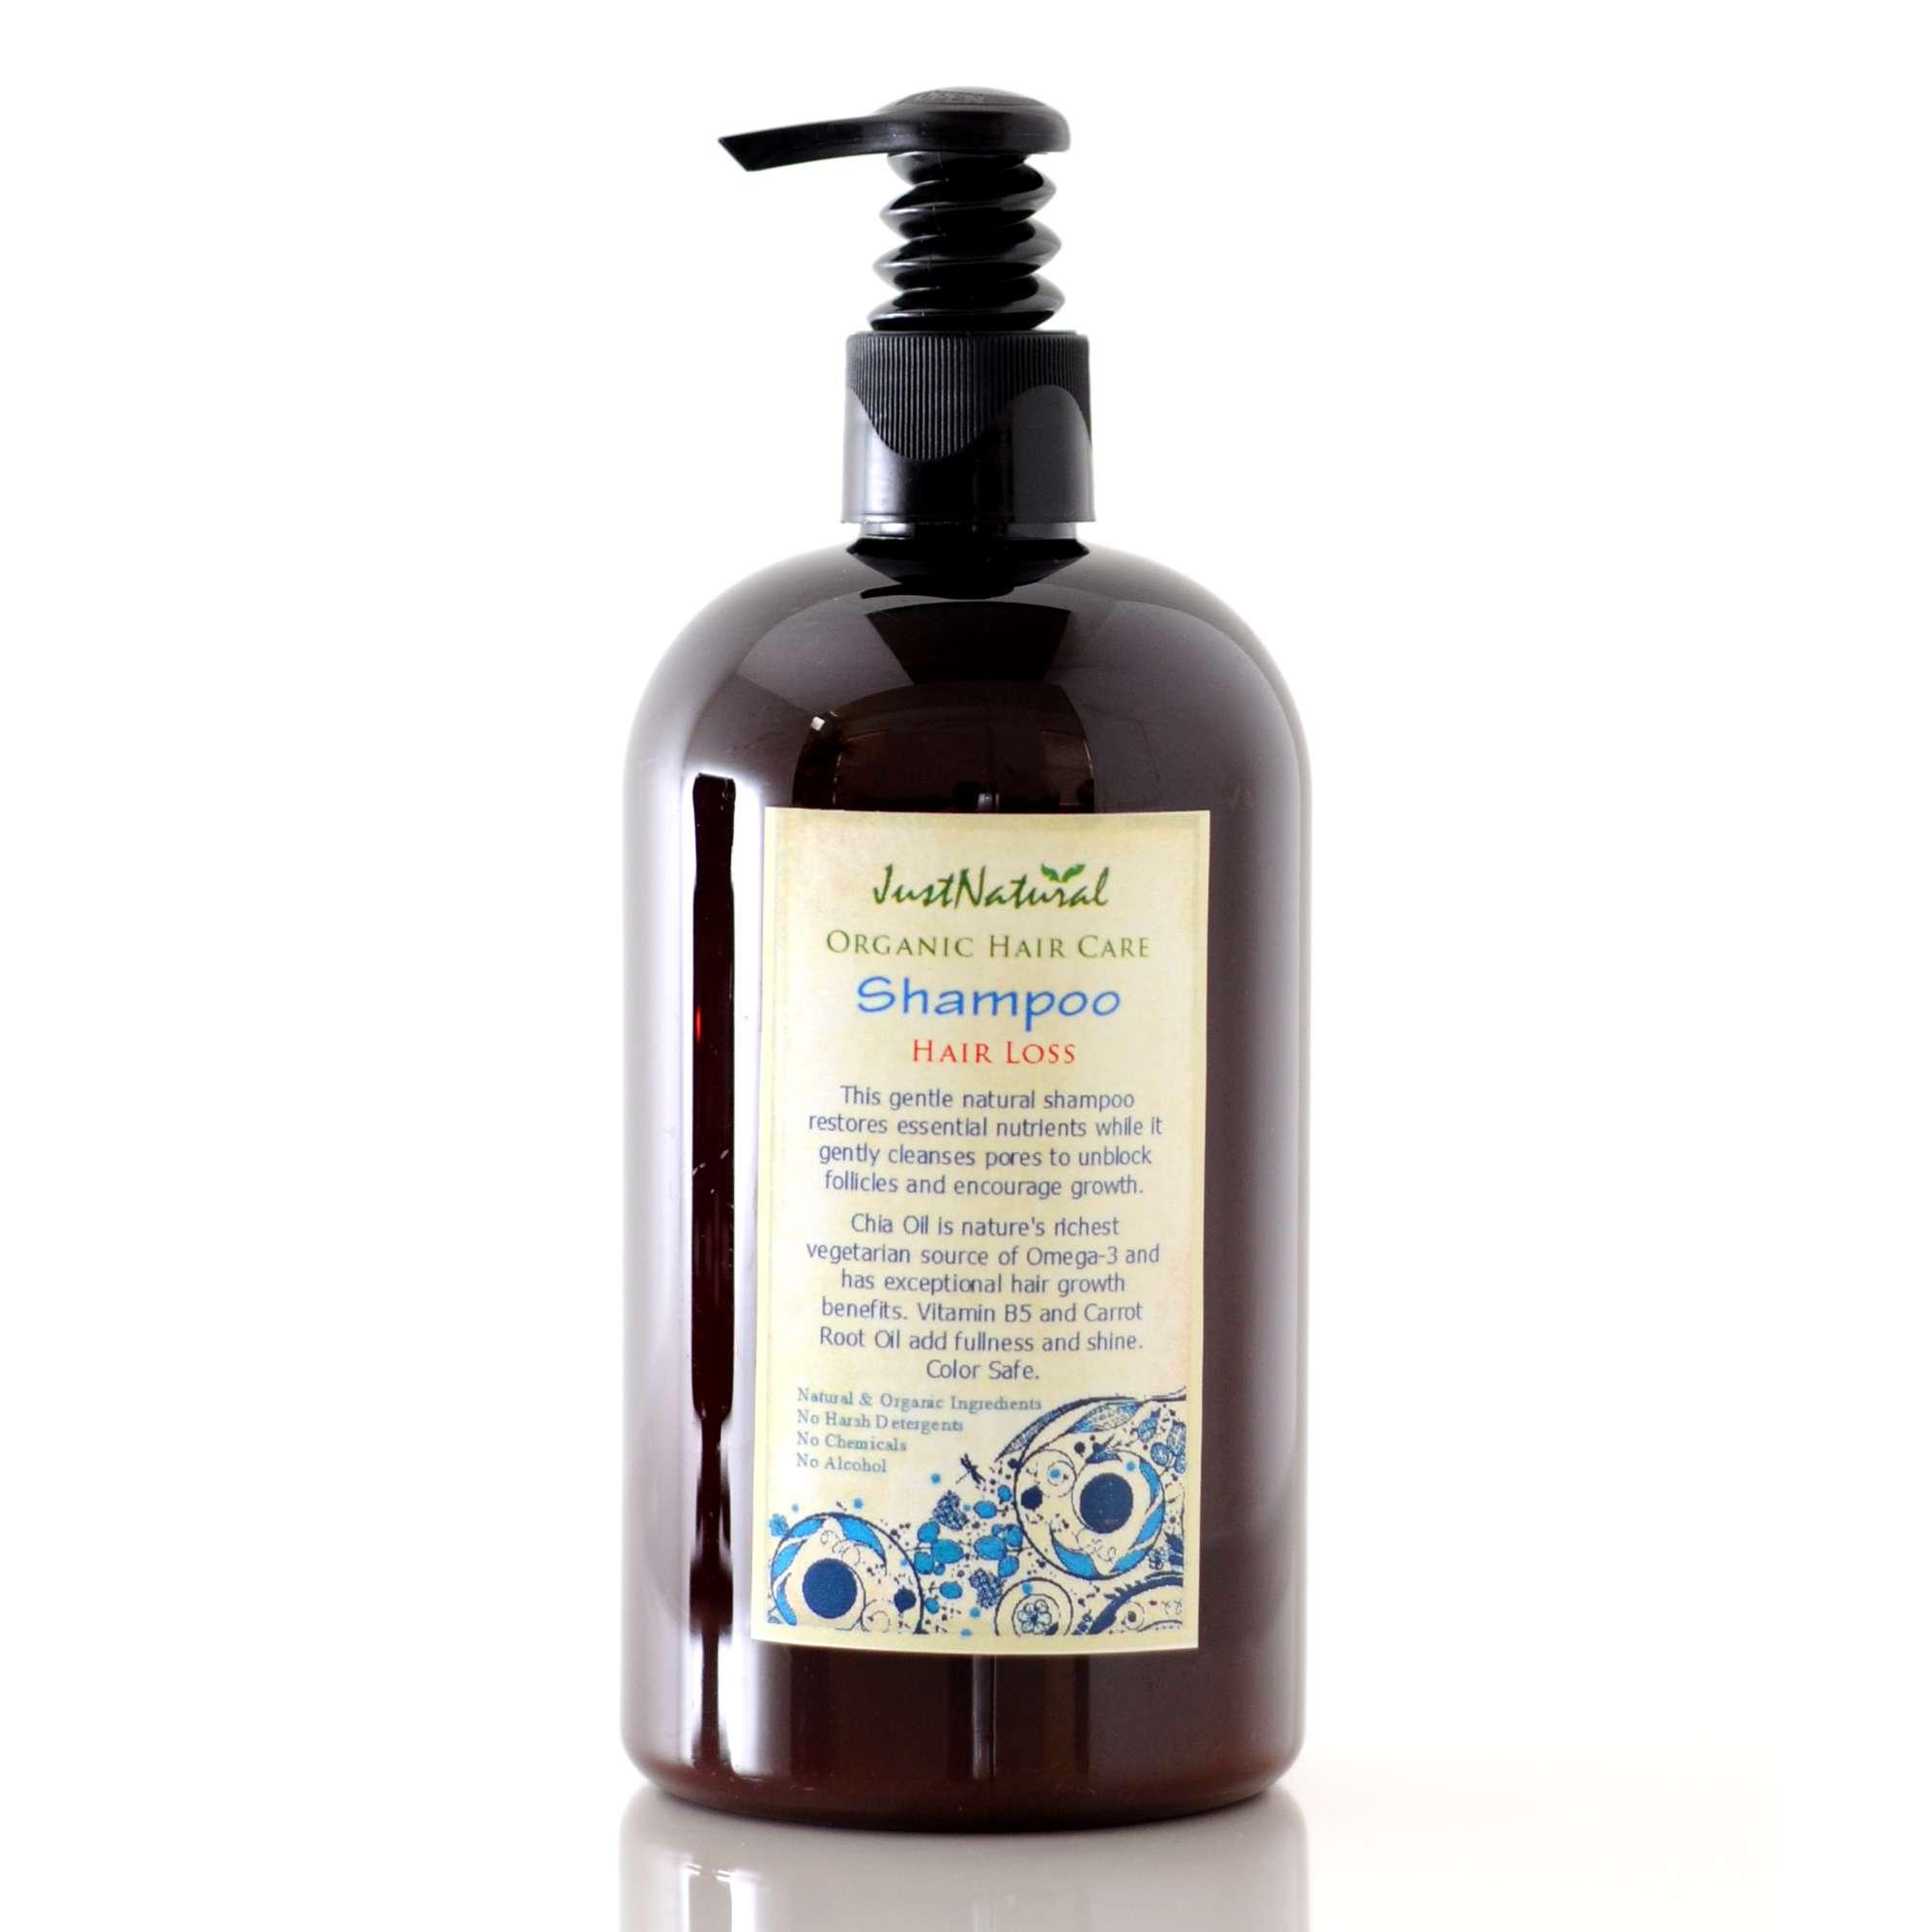 Hair loss shampoo for better hair growth